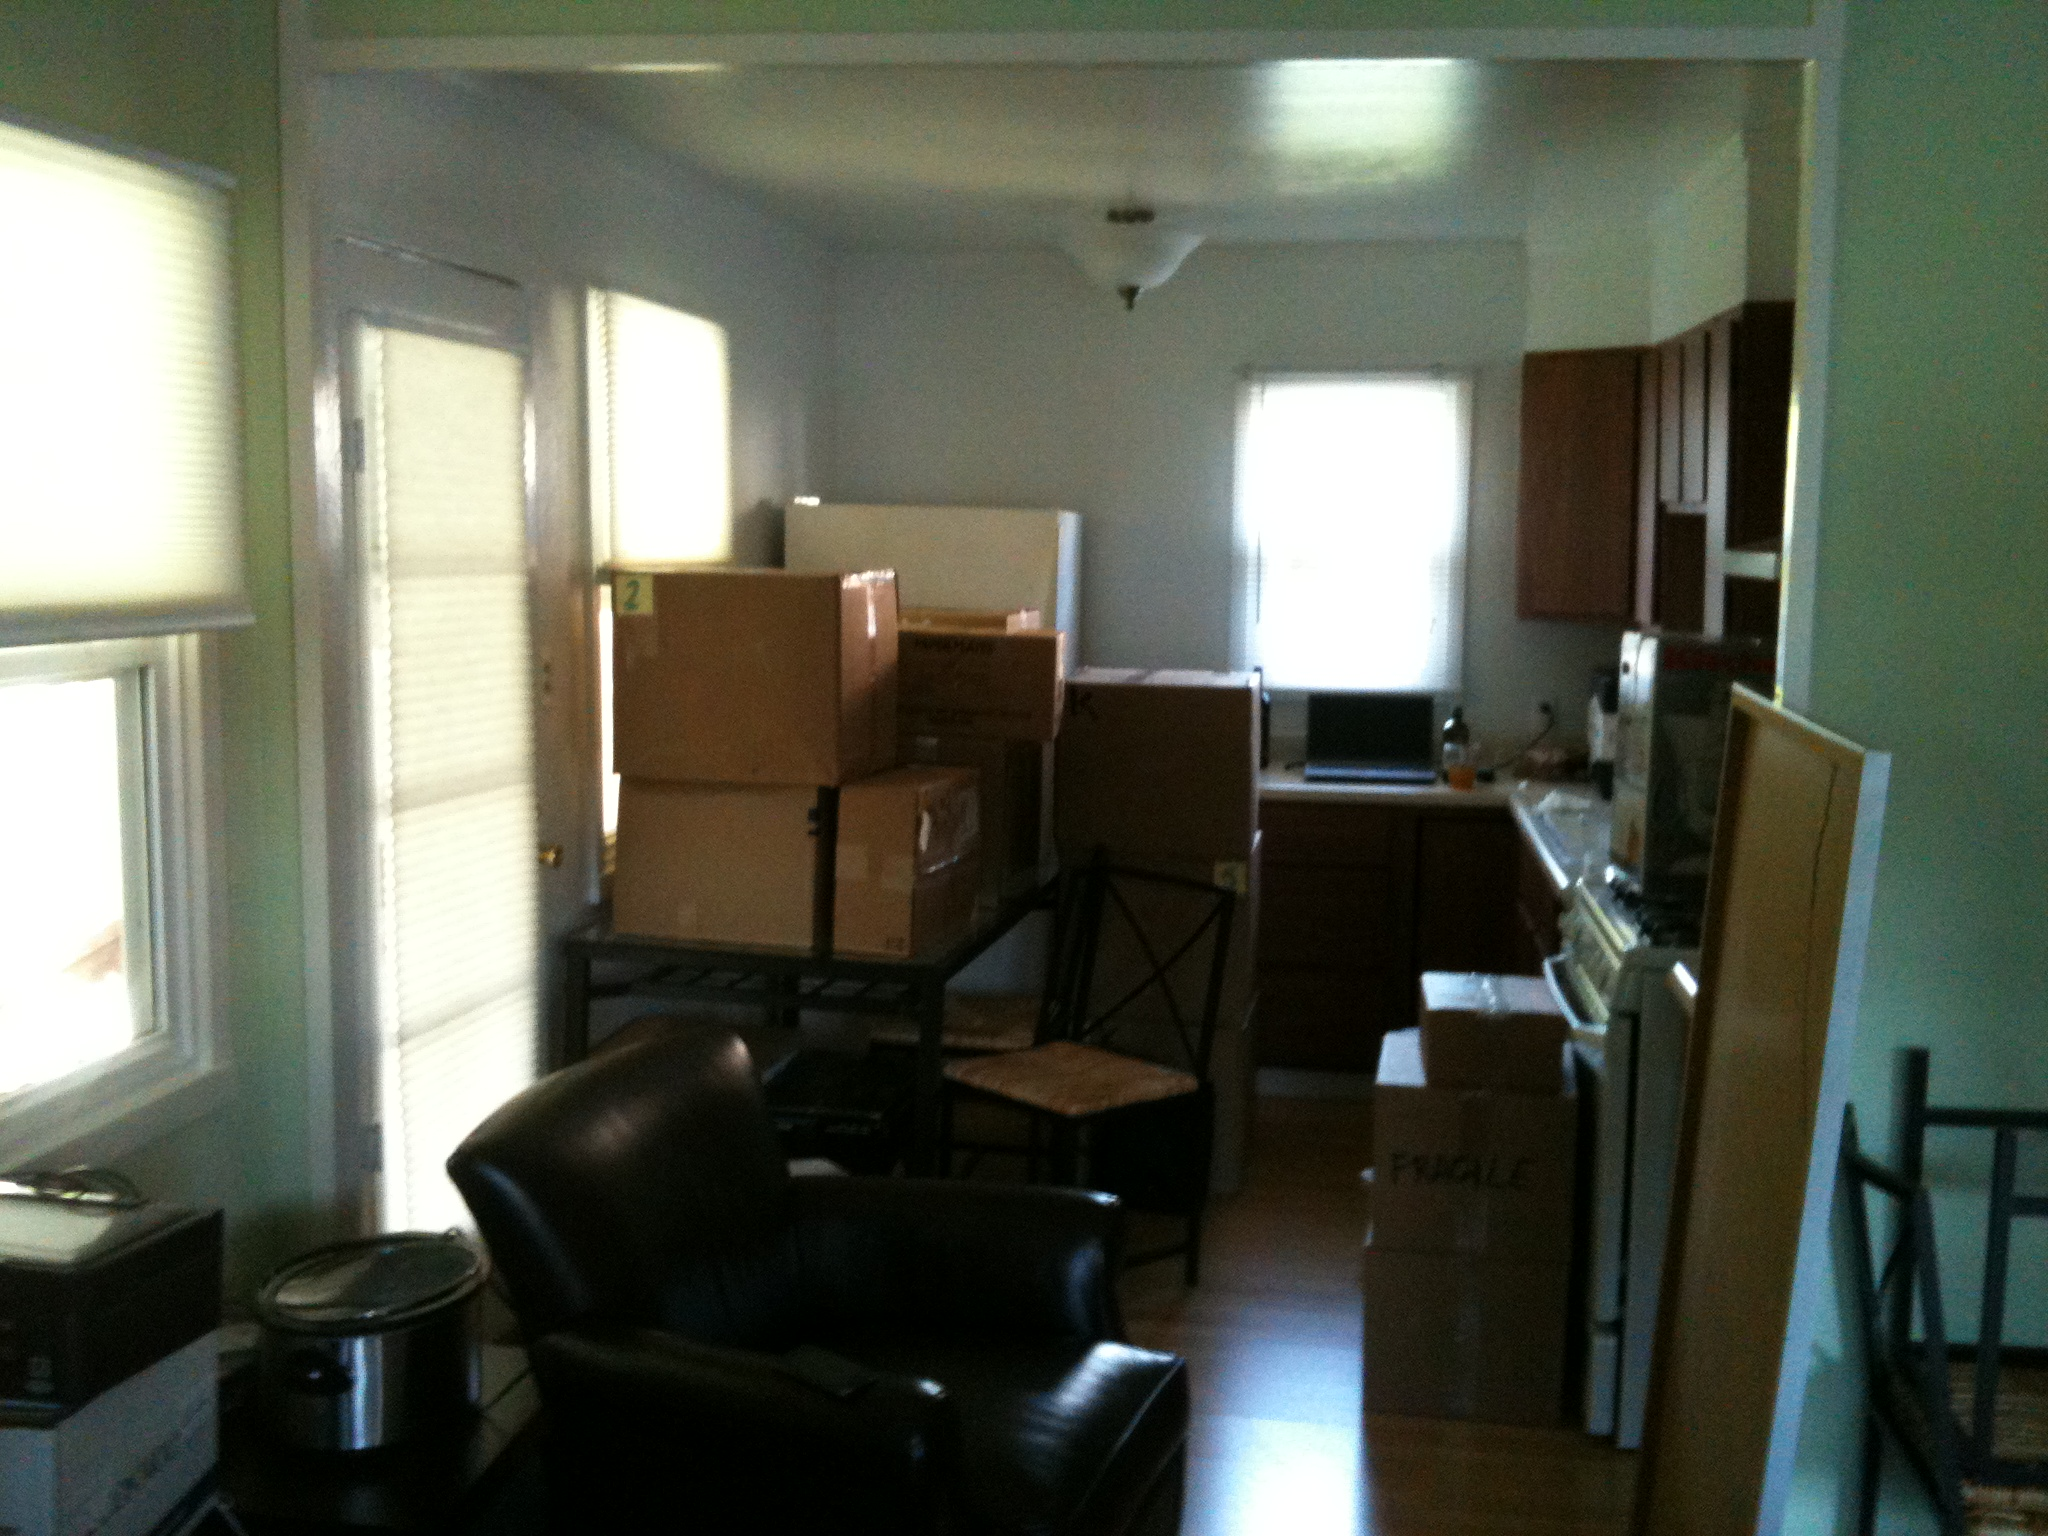 Unpacking :-(